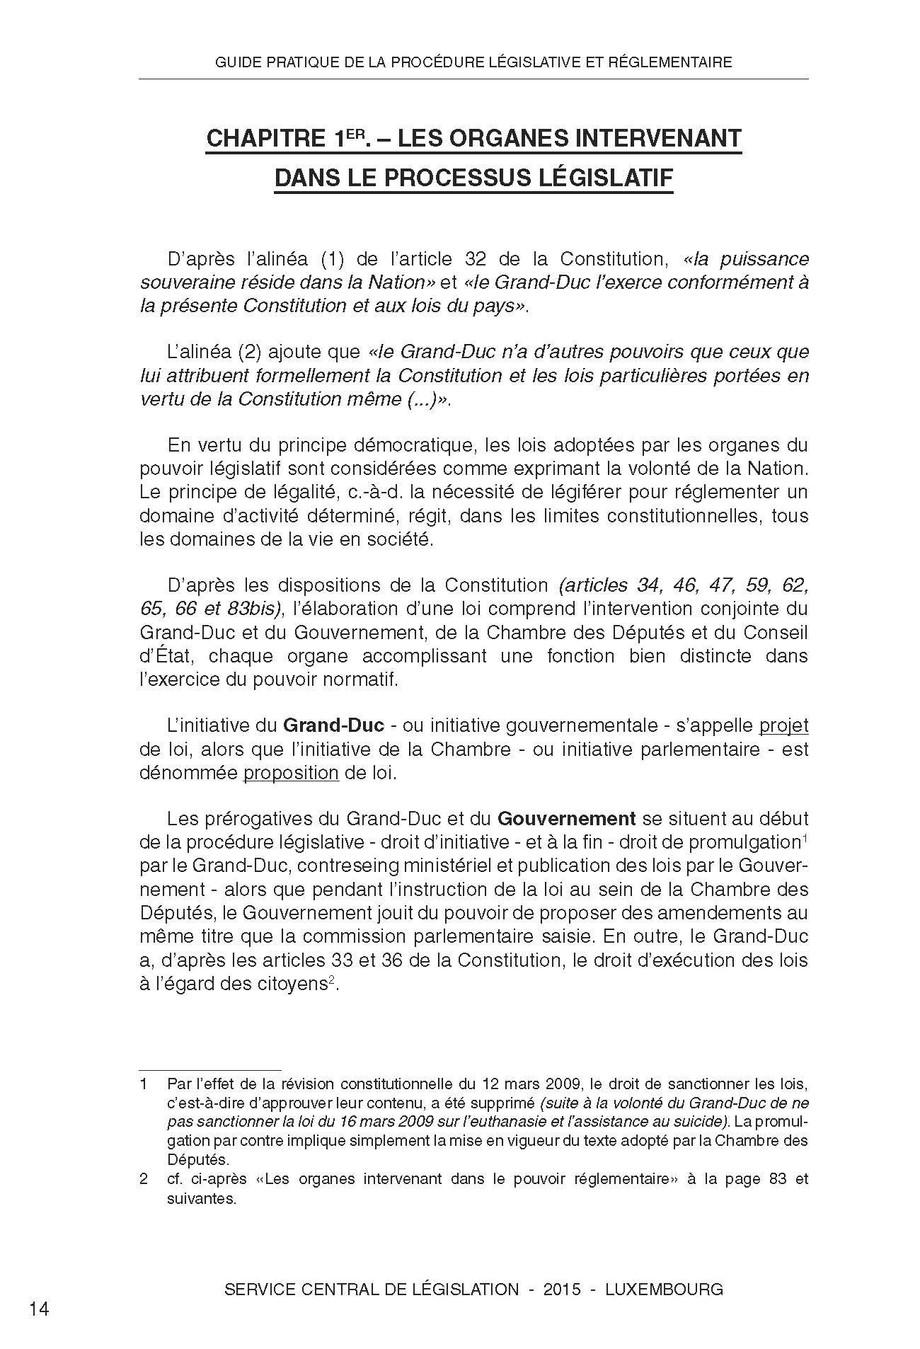 Pages from recueil-procedure_legislative-20150301-fr-pdf_Page_14.jpg